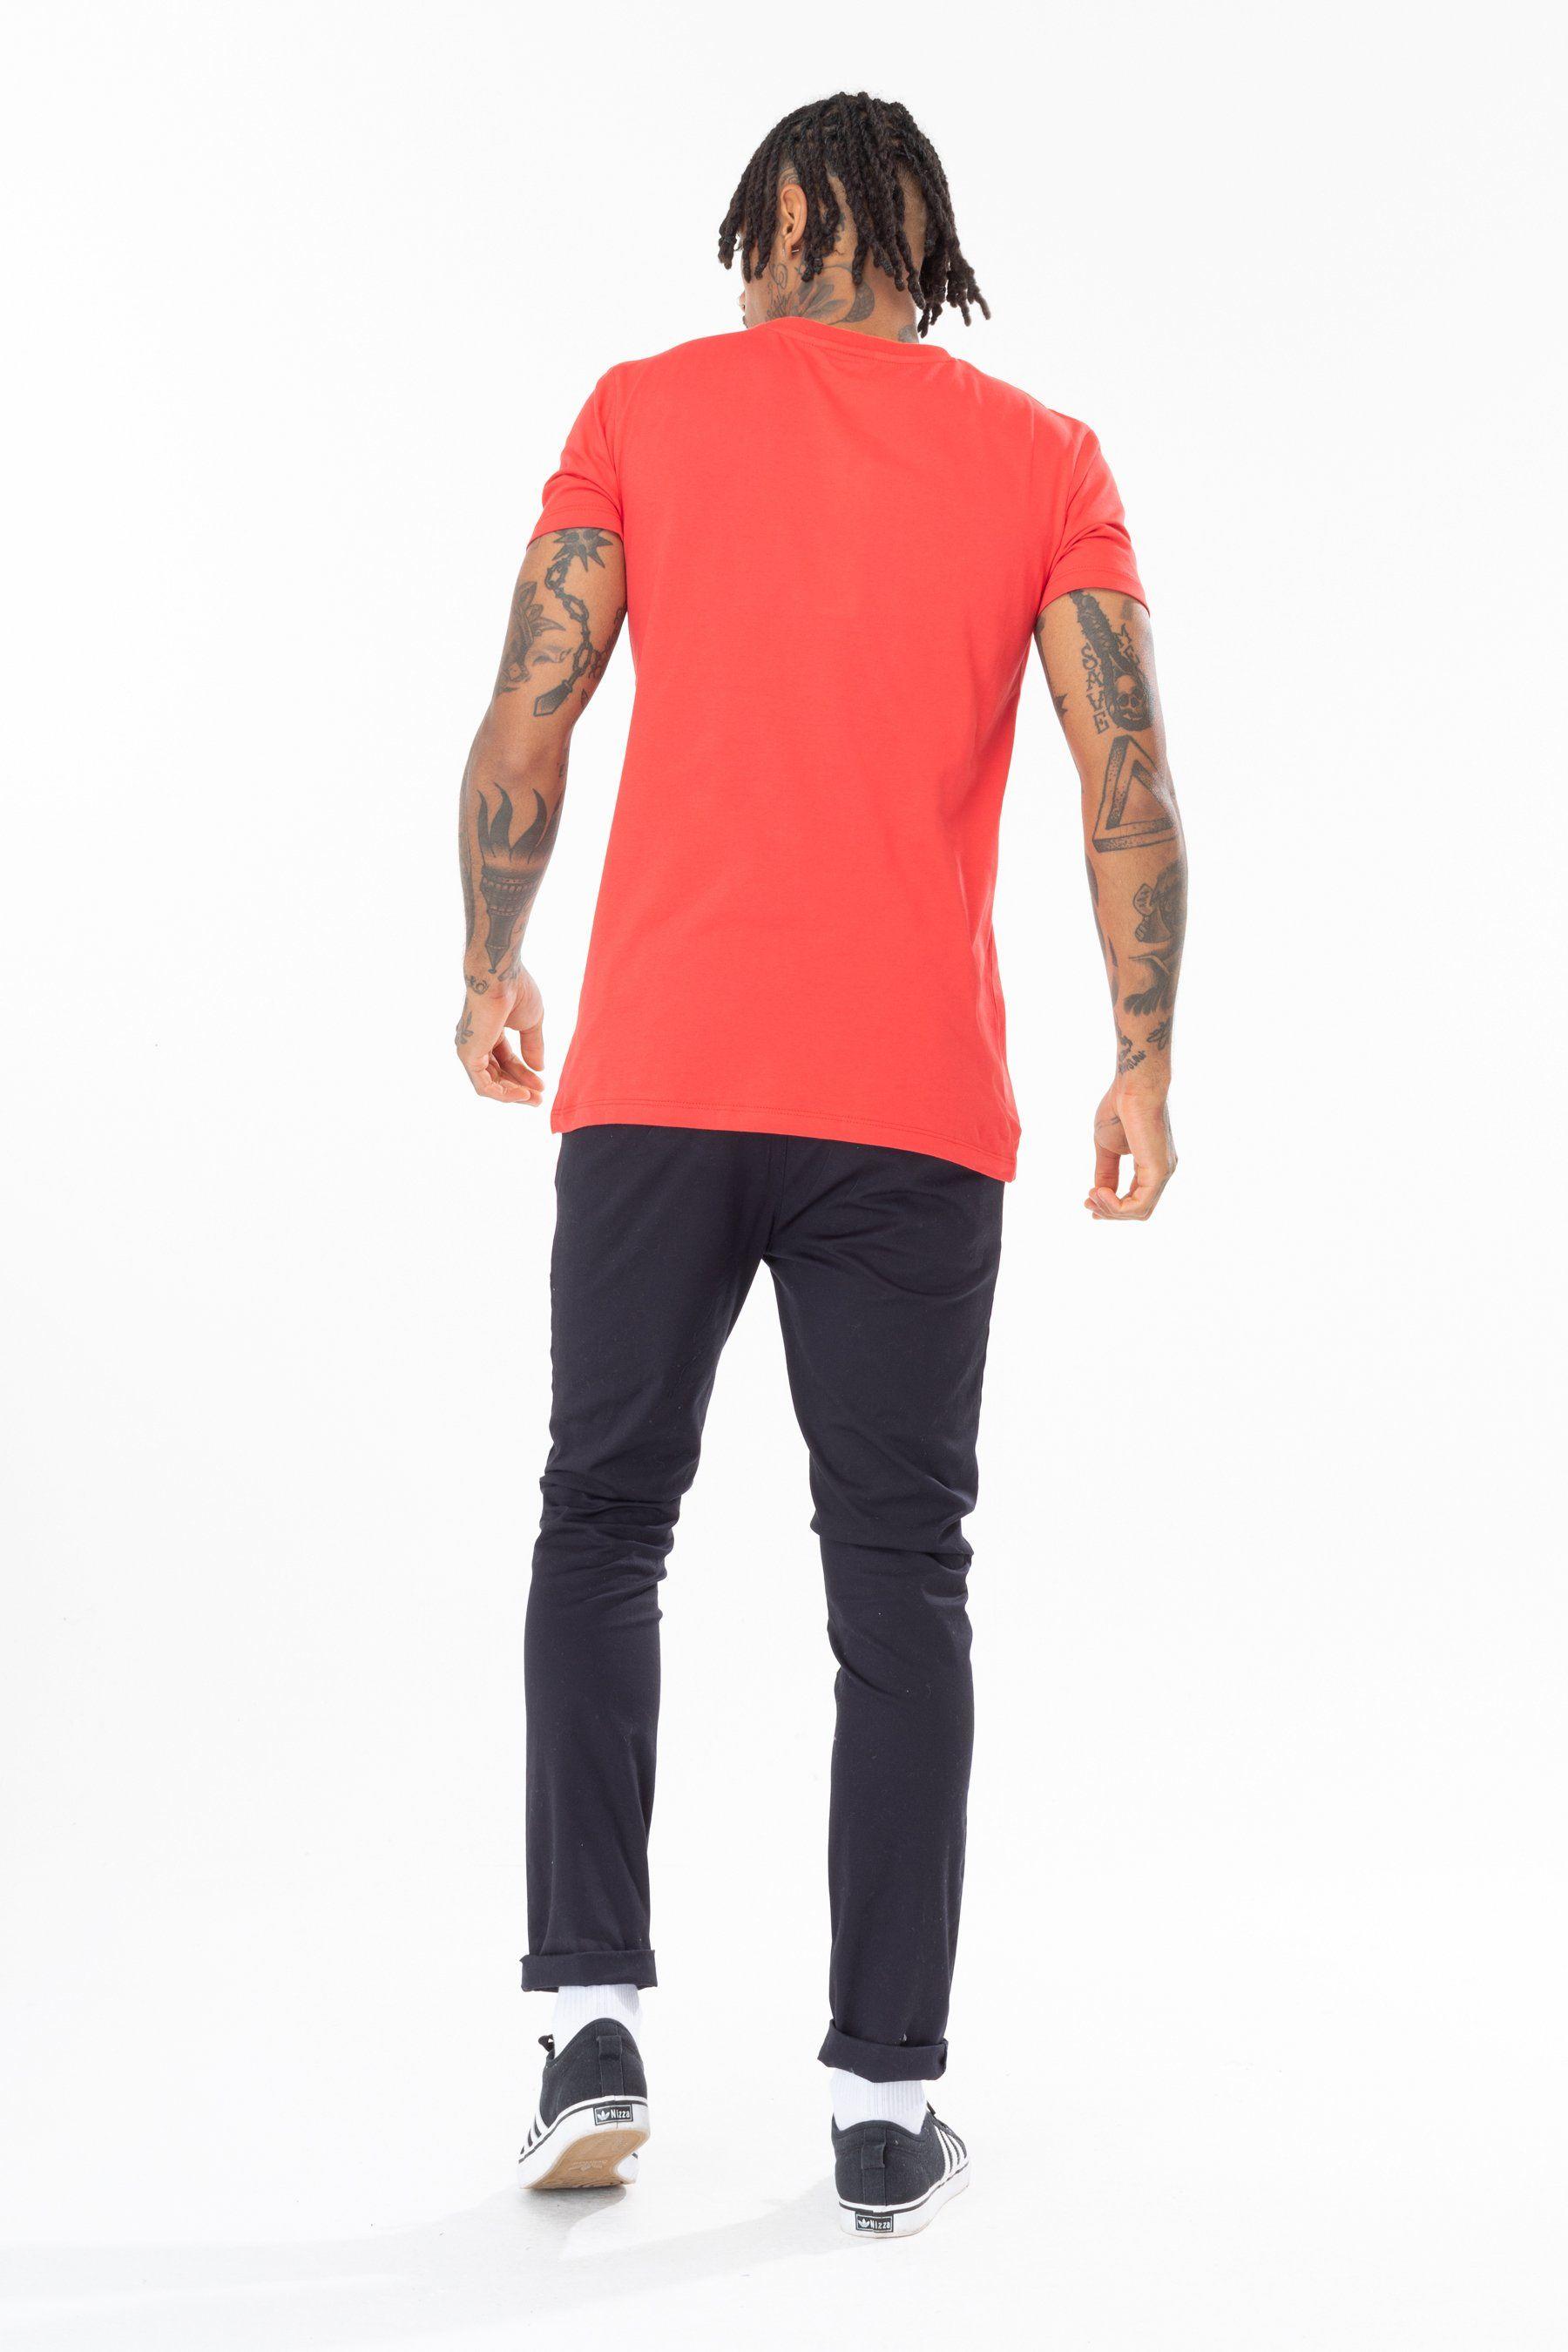 Hype Red Speckle Script Mens T-Shirt S